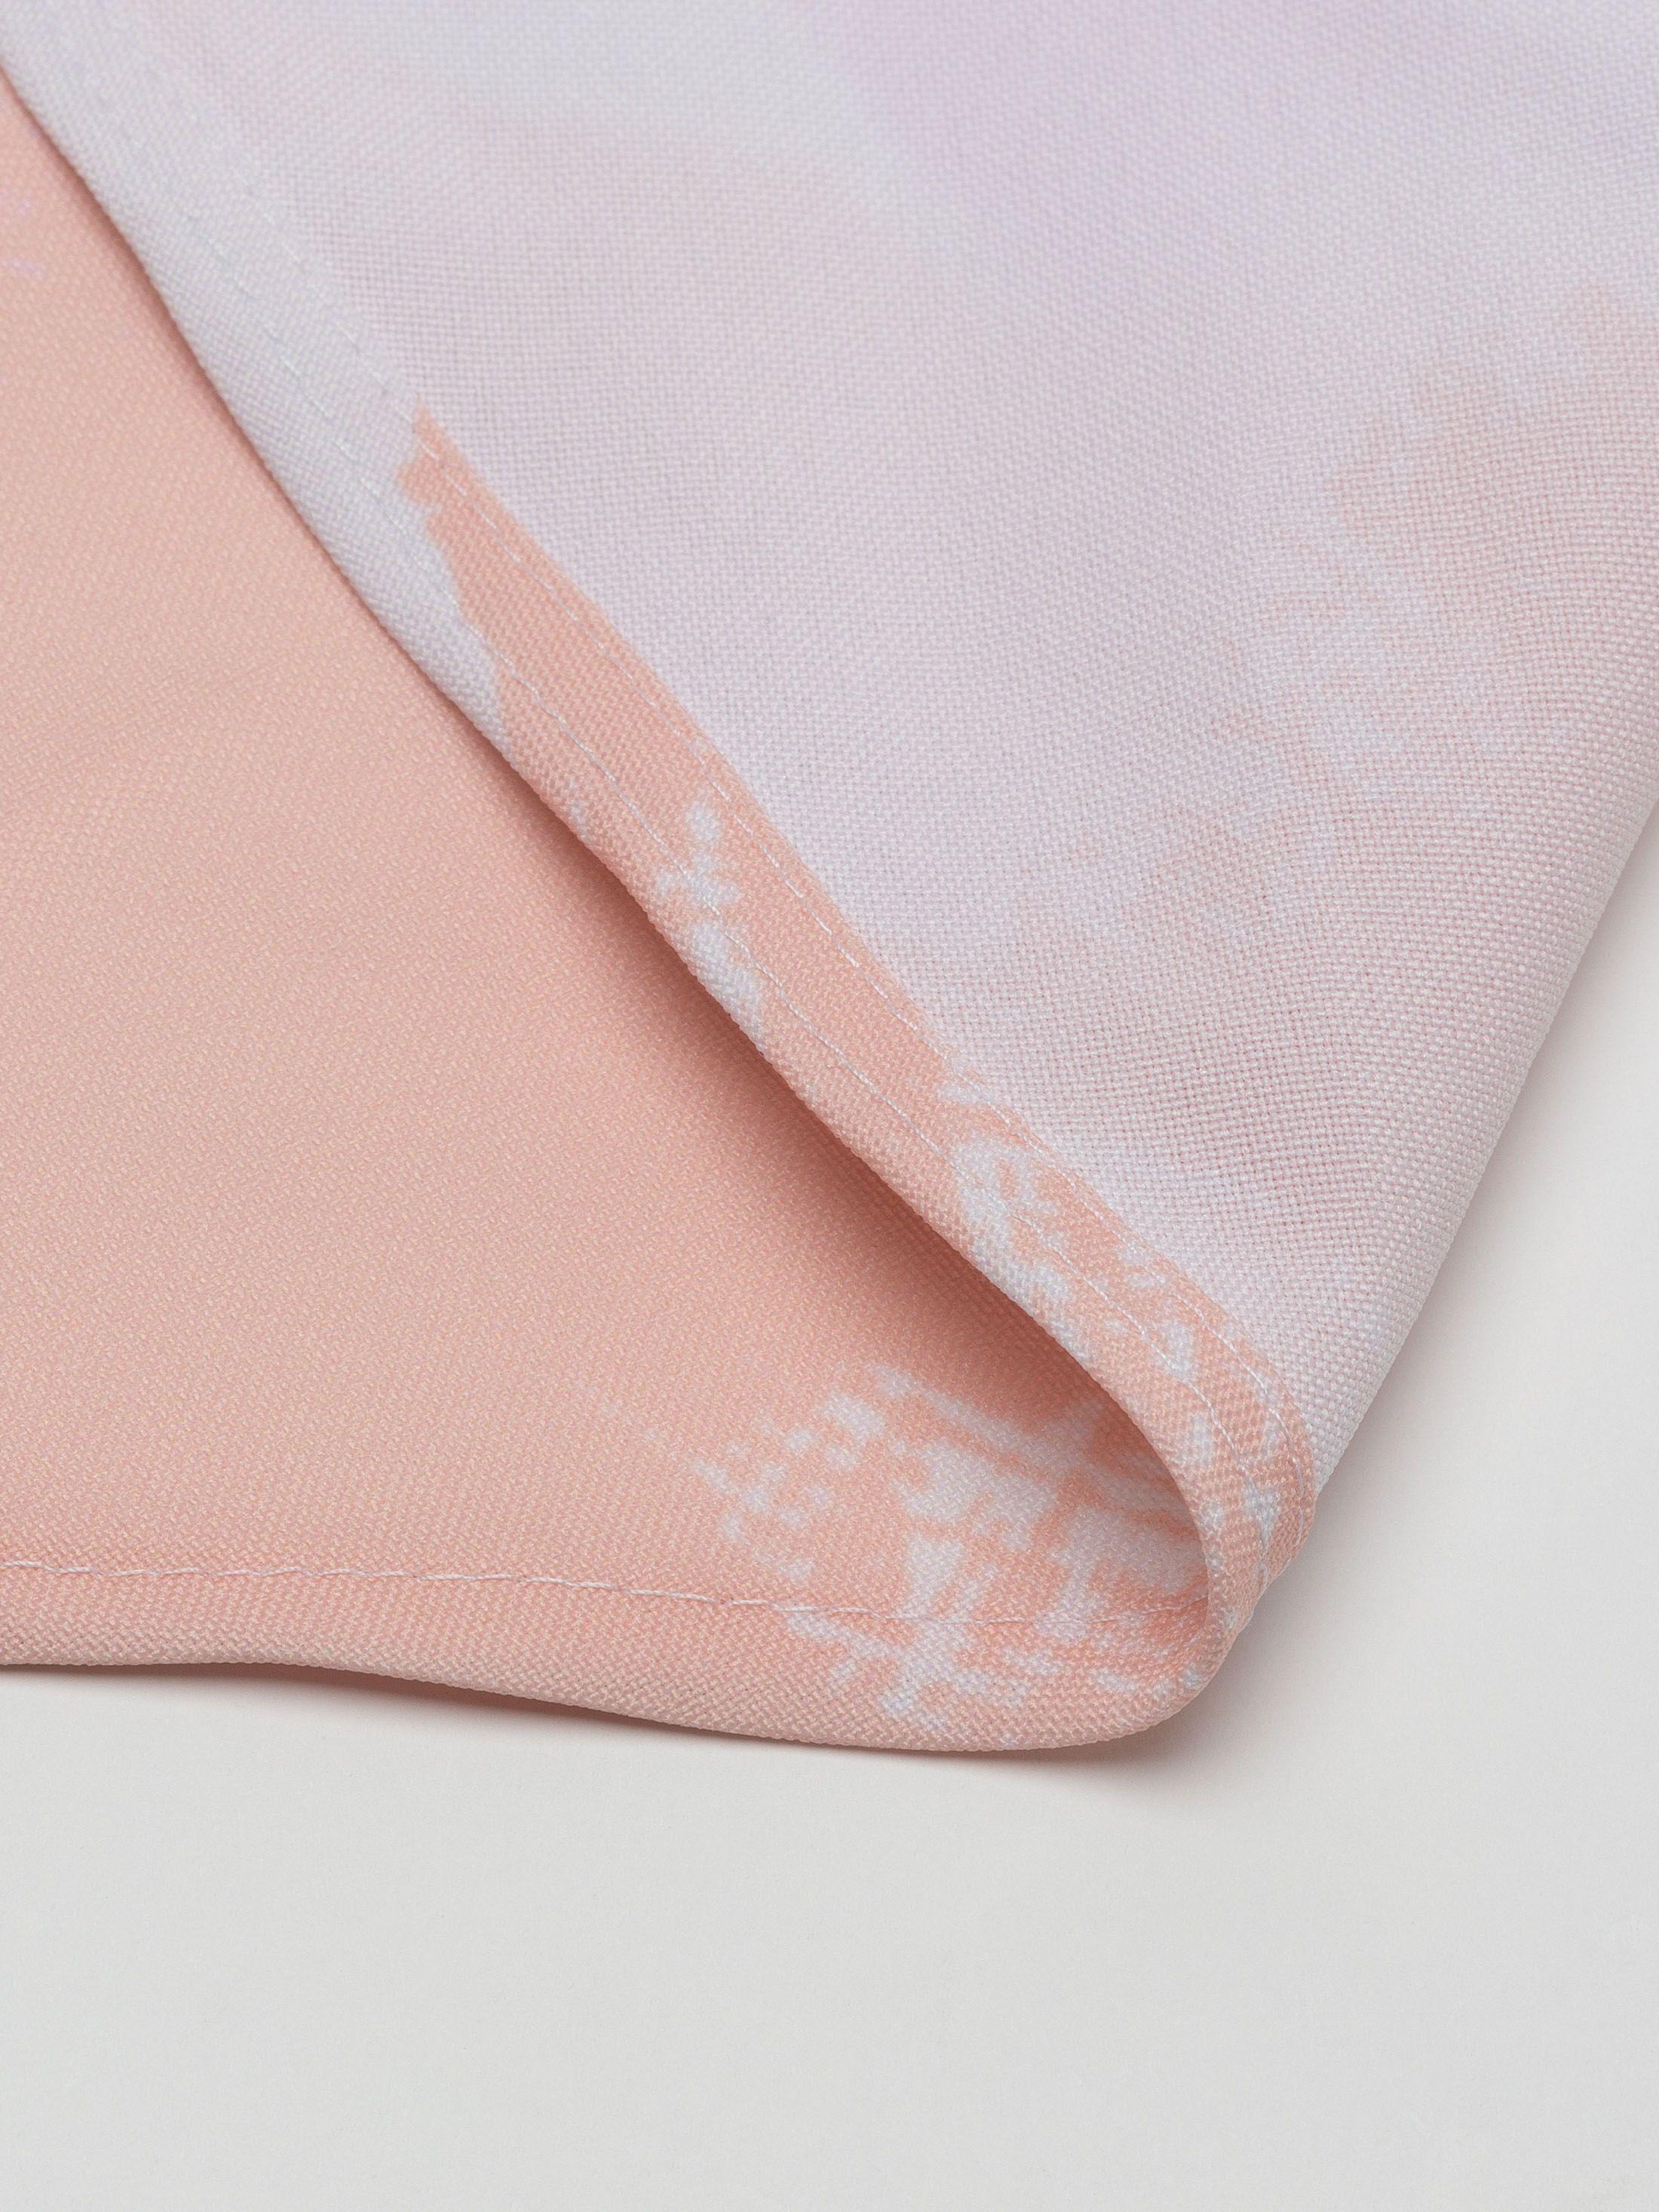 custom tablecloths detail